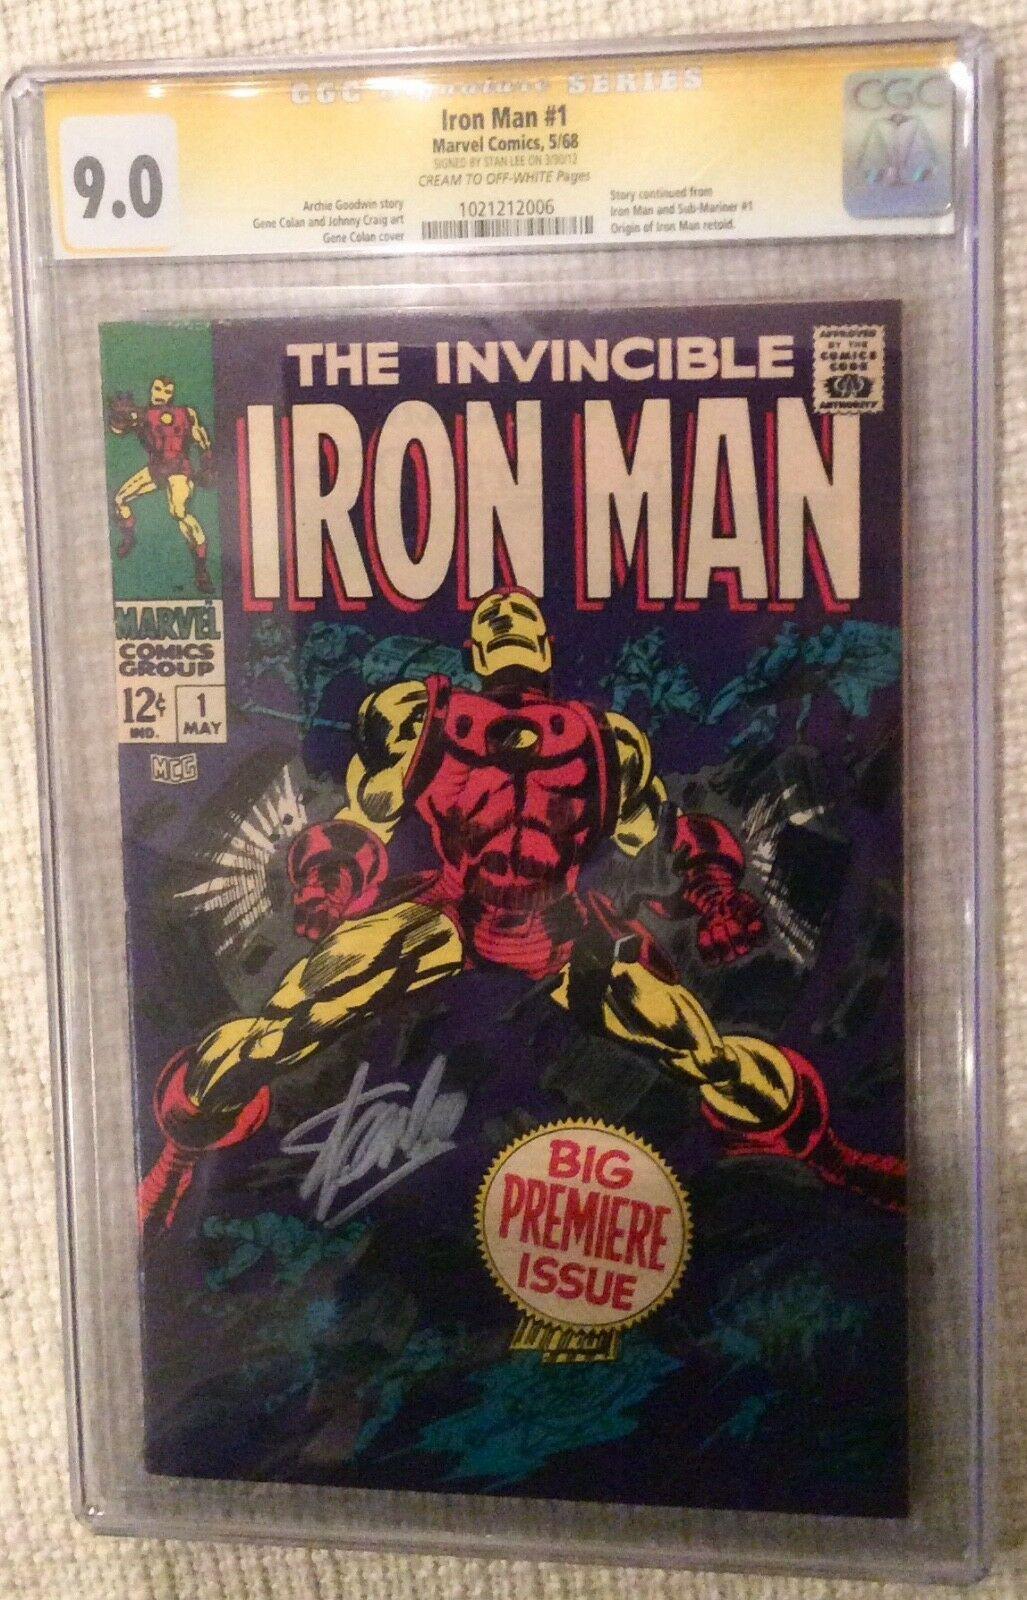 Iron man # 1 cgc 9.0 Stan Lee Sig, 55 Rare, Unpressed, Avengers ASM Tales 39